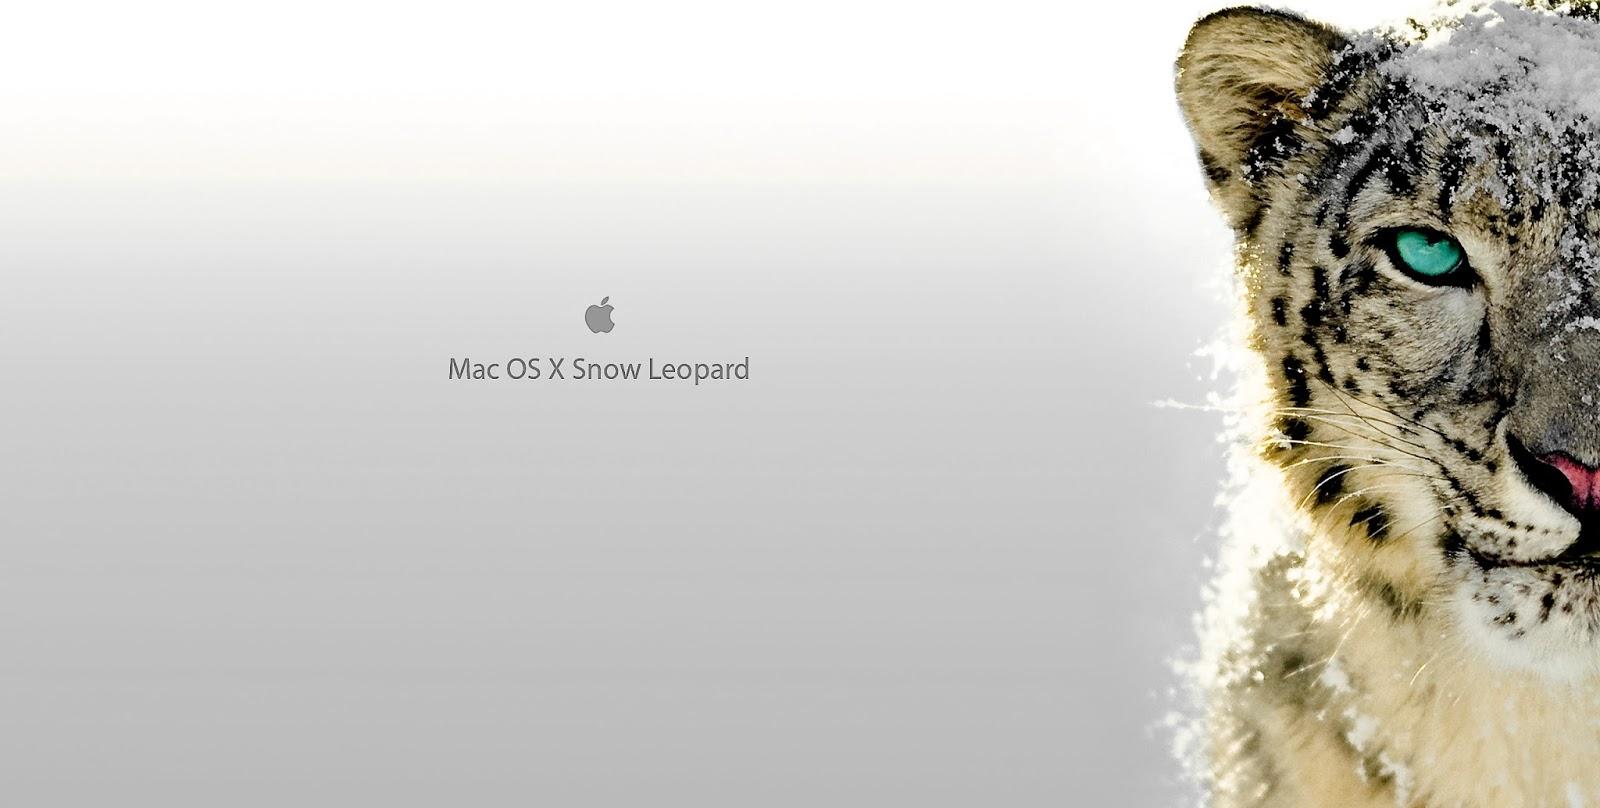 Mac os x leopard 10 5 4 9e25 retail dmg : mingskelbio